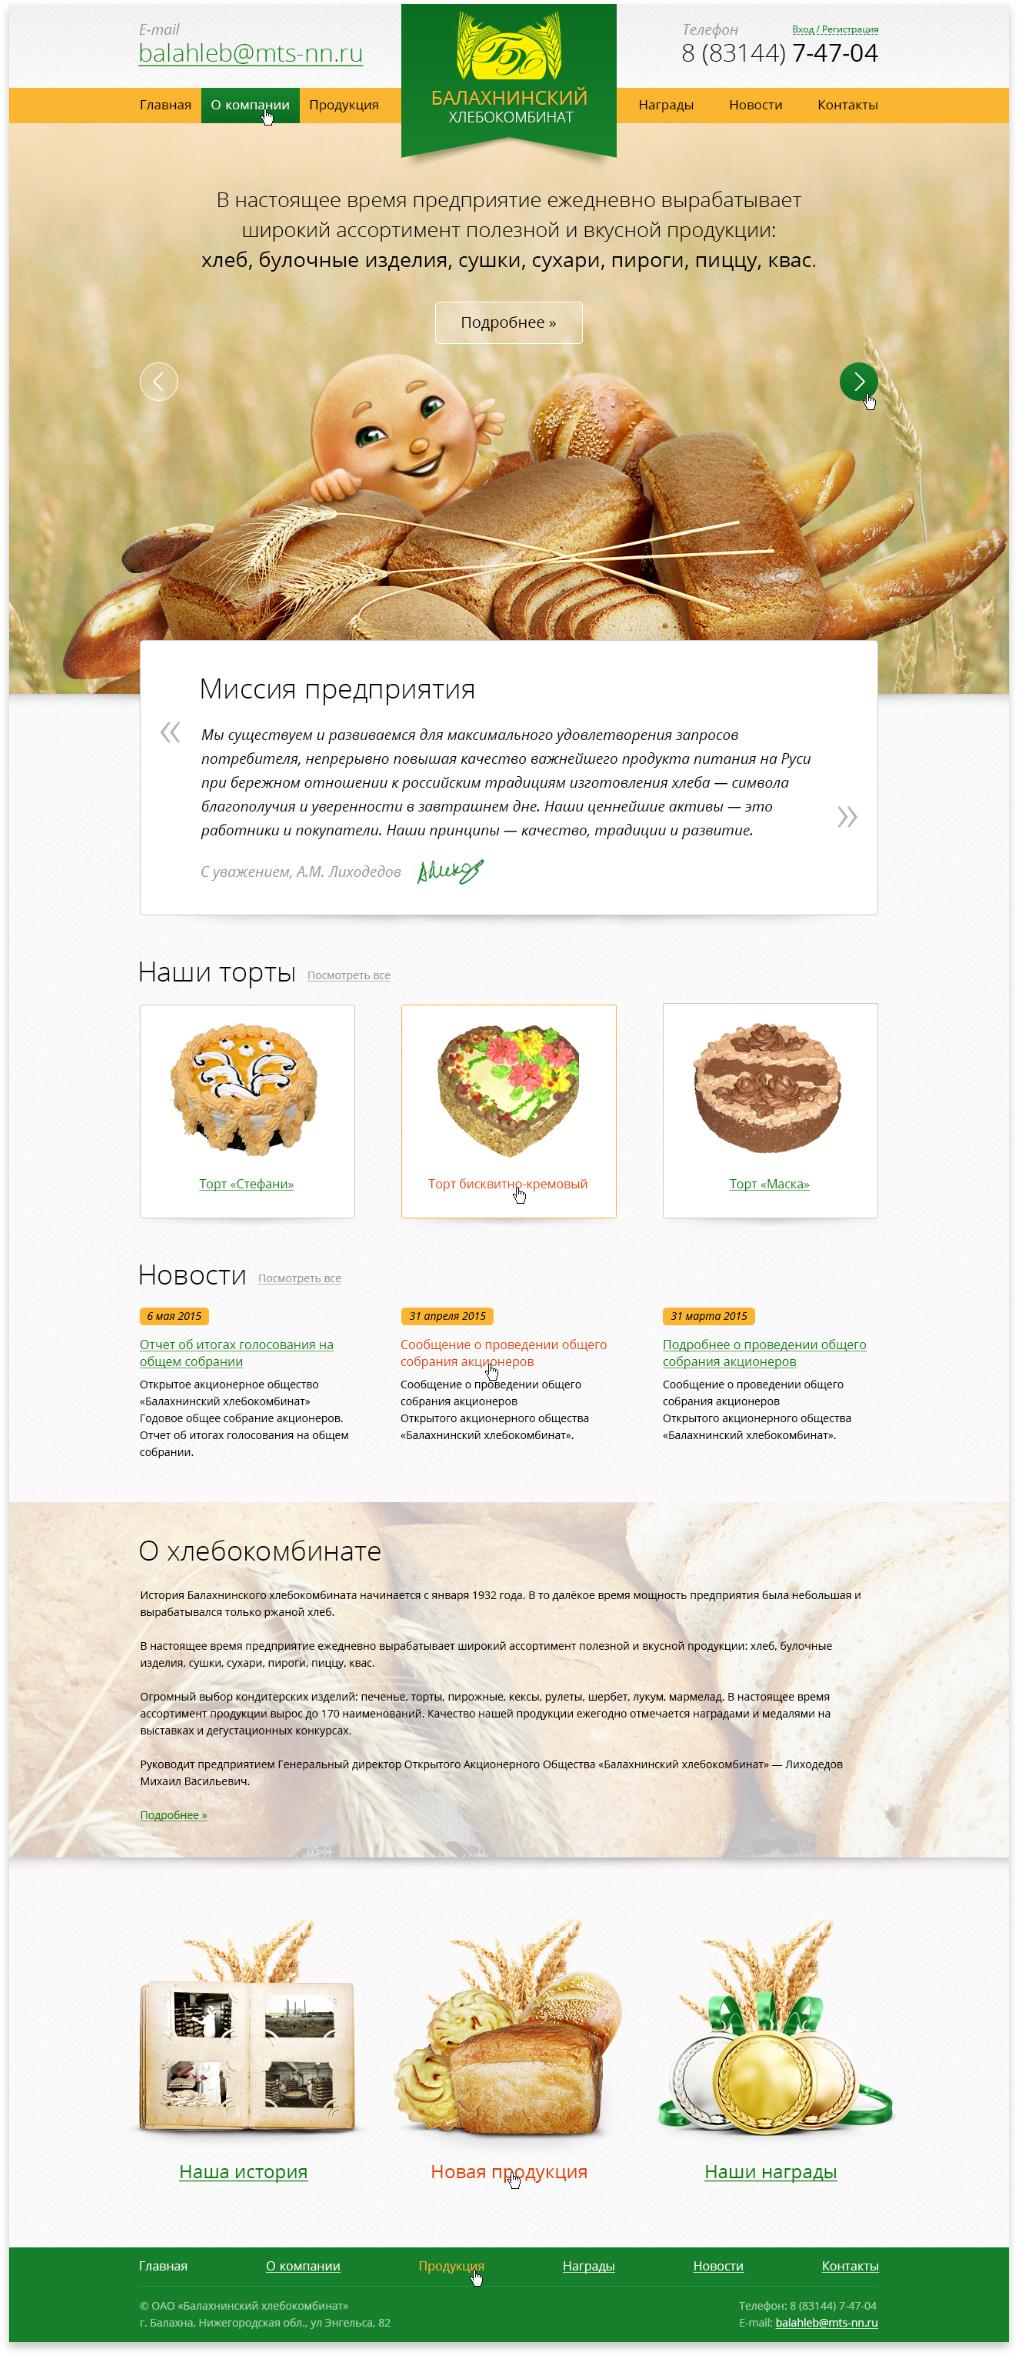 Корпоративный сайт: Хлебокомбинат